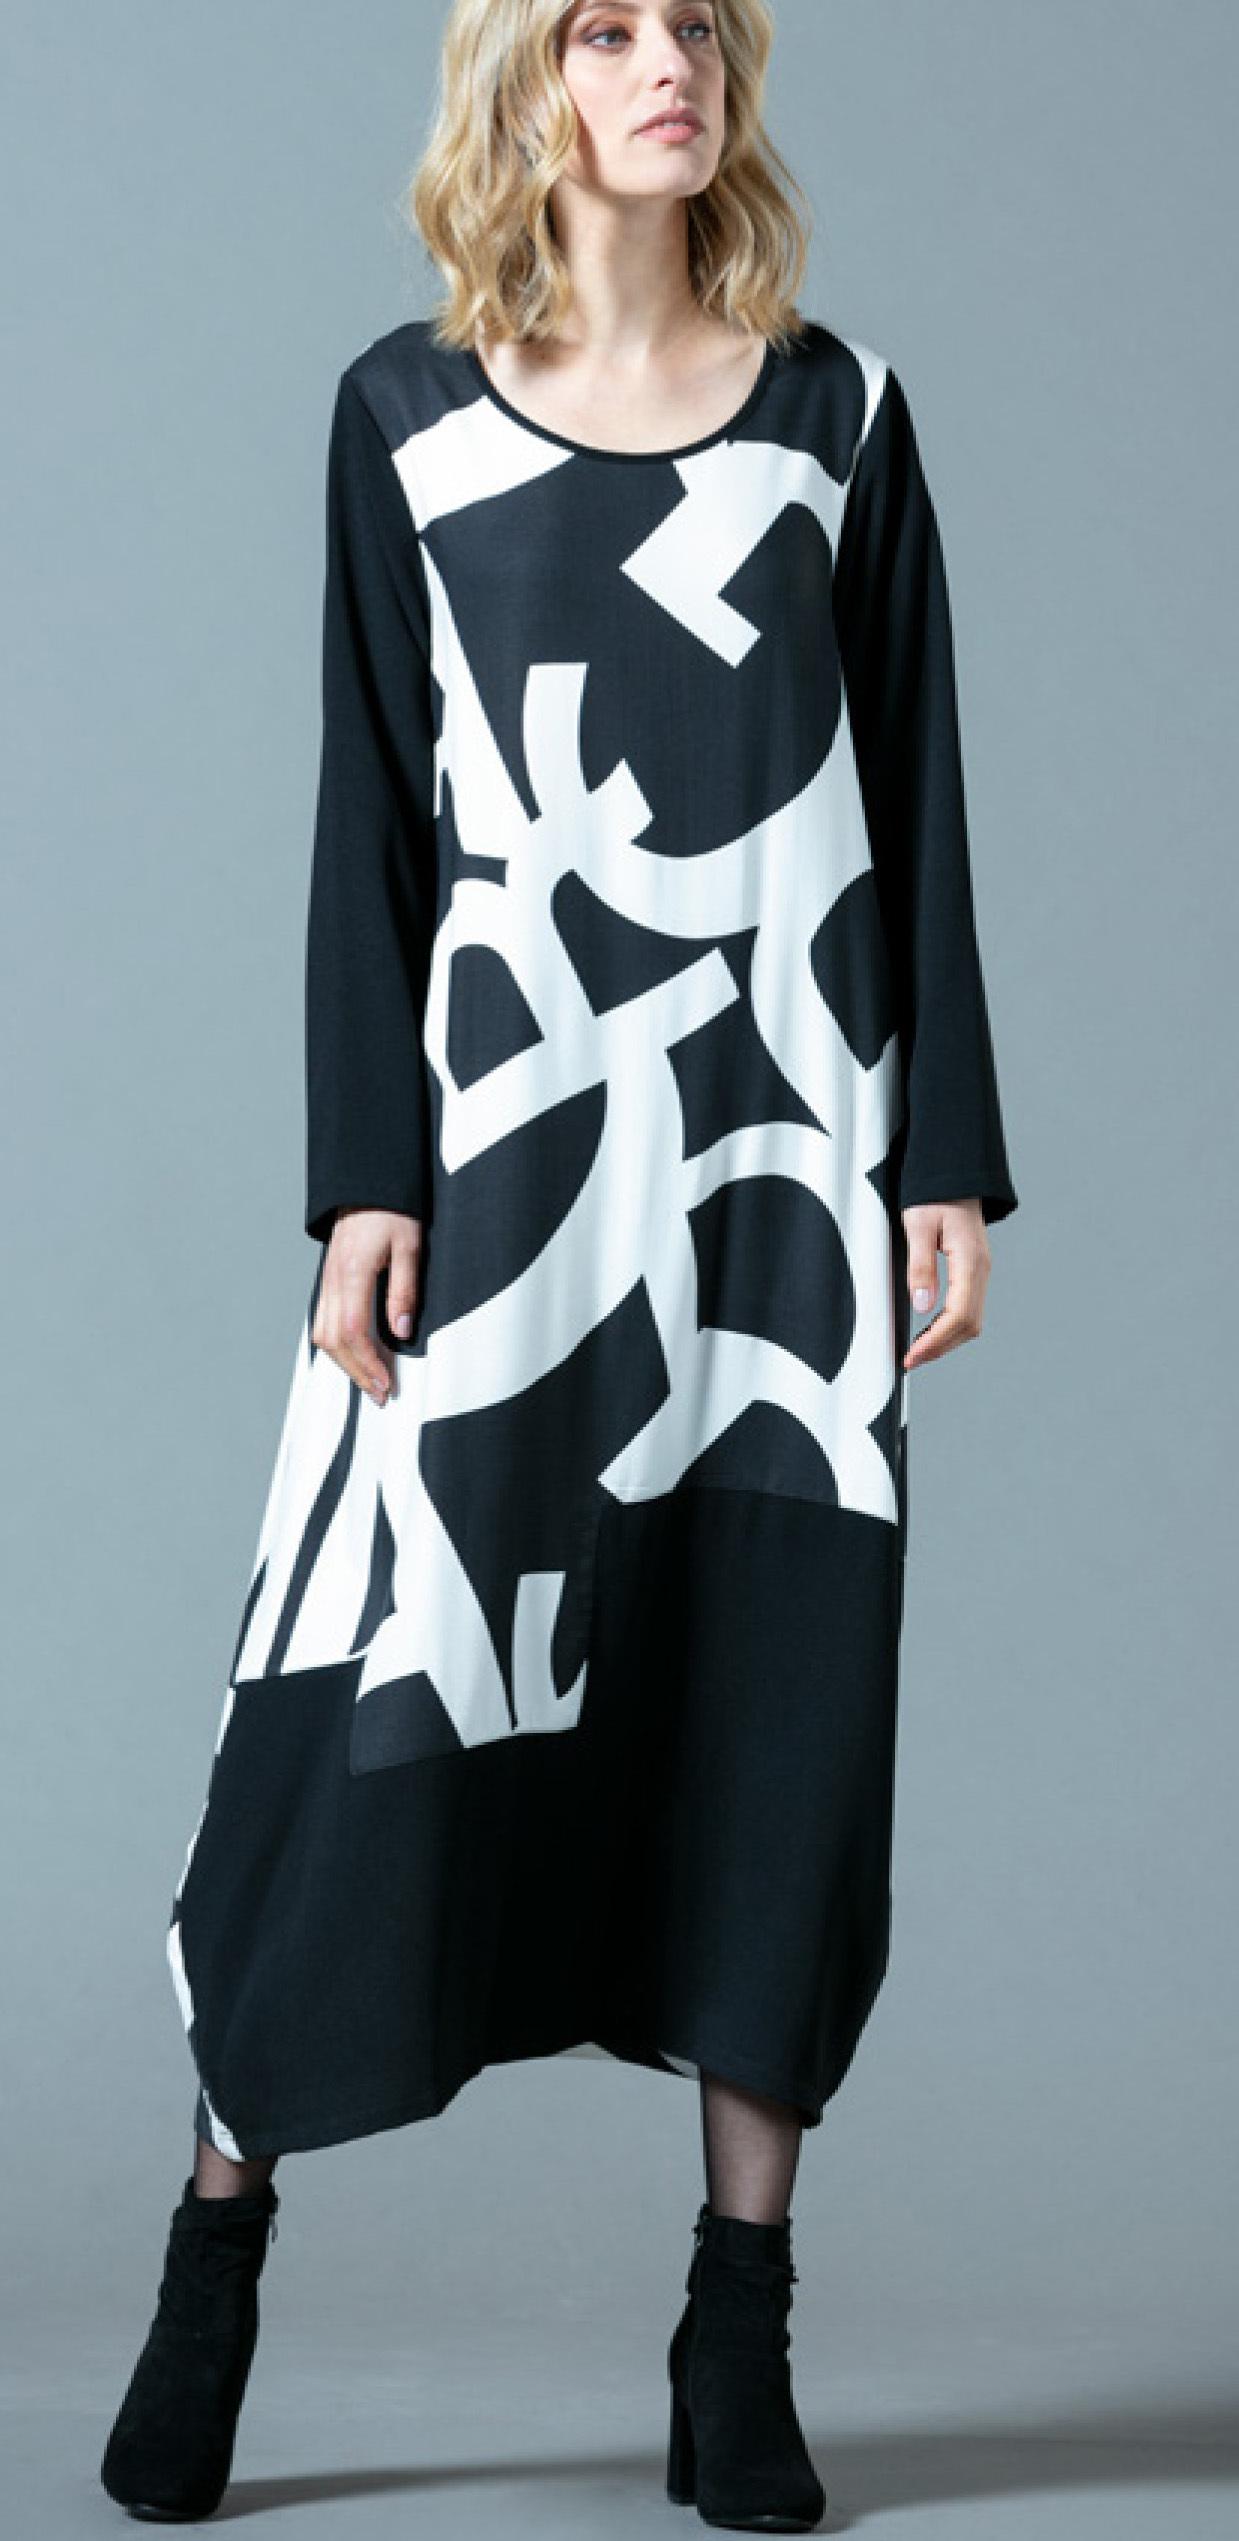 G!oze: Wear Me A Letter Asymmetrical Bubble Dress G_EXTASE